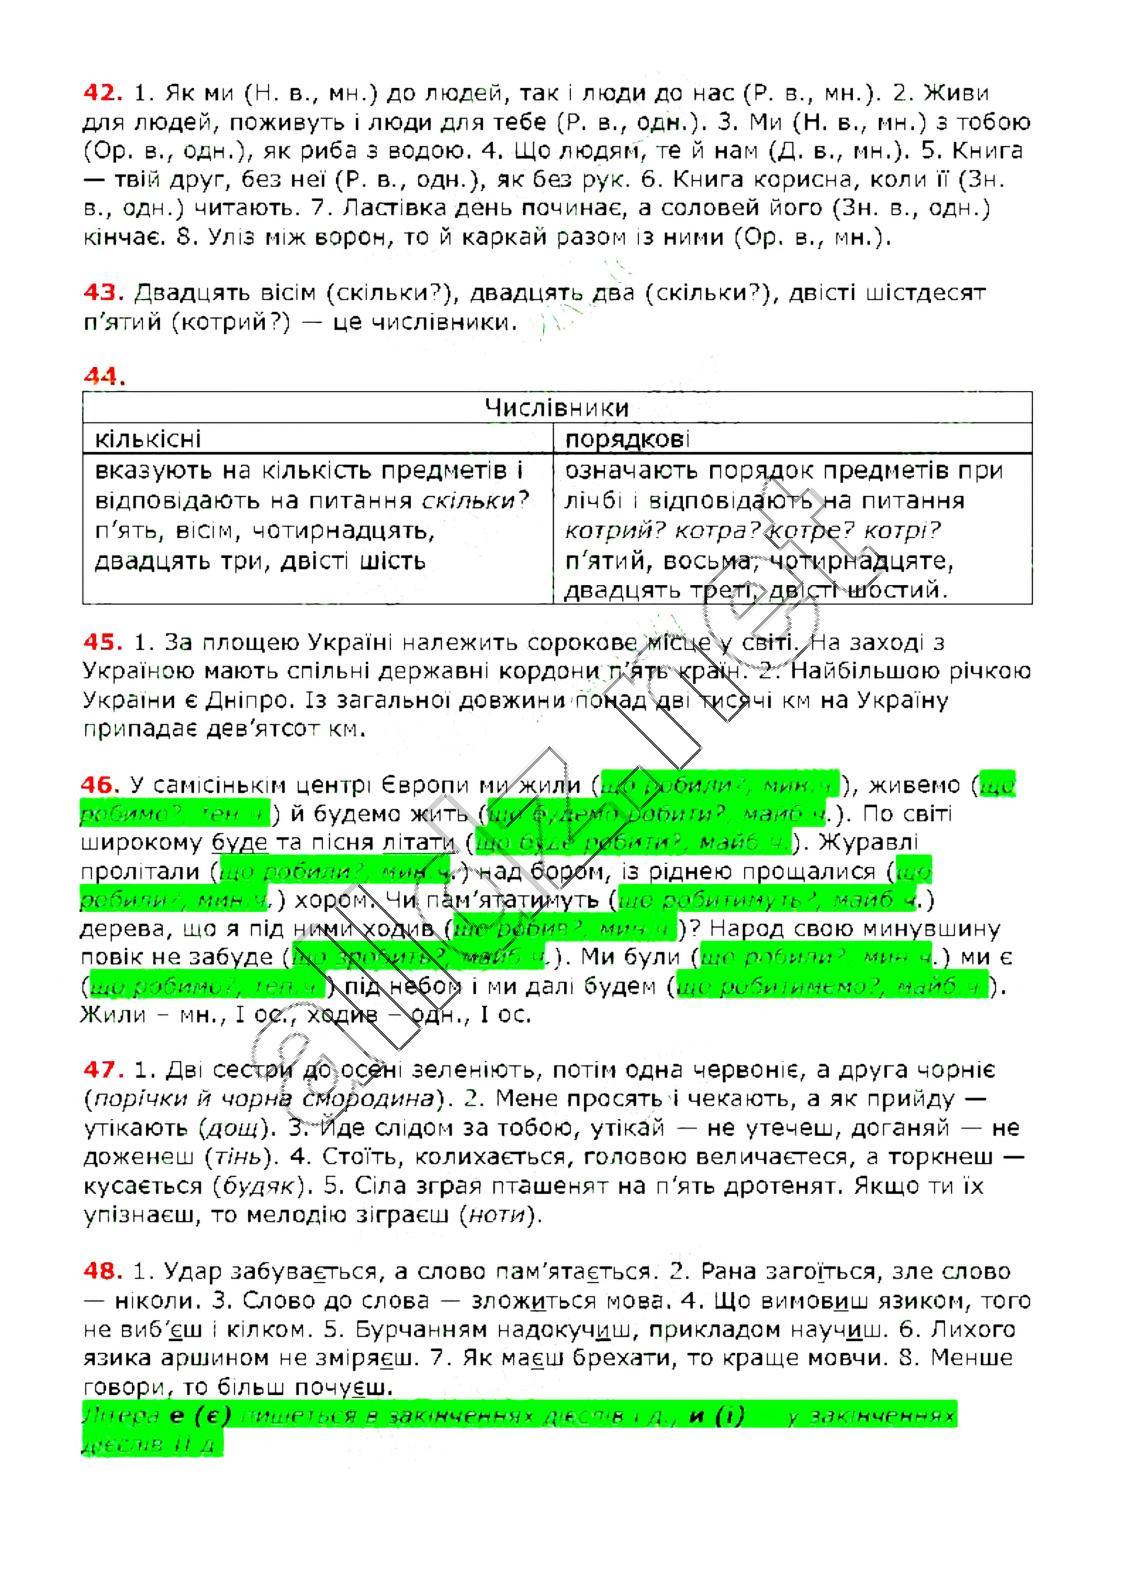 ГДЗ Українська мова 5 клас Глазова 2018 - CALAMEO Downloader 073d8f8b3d469